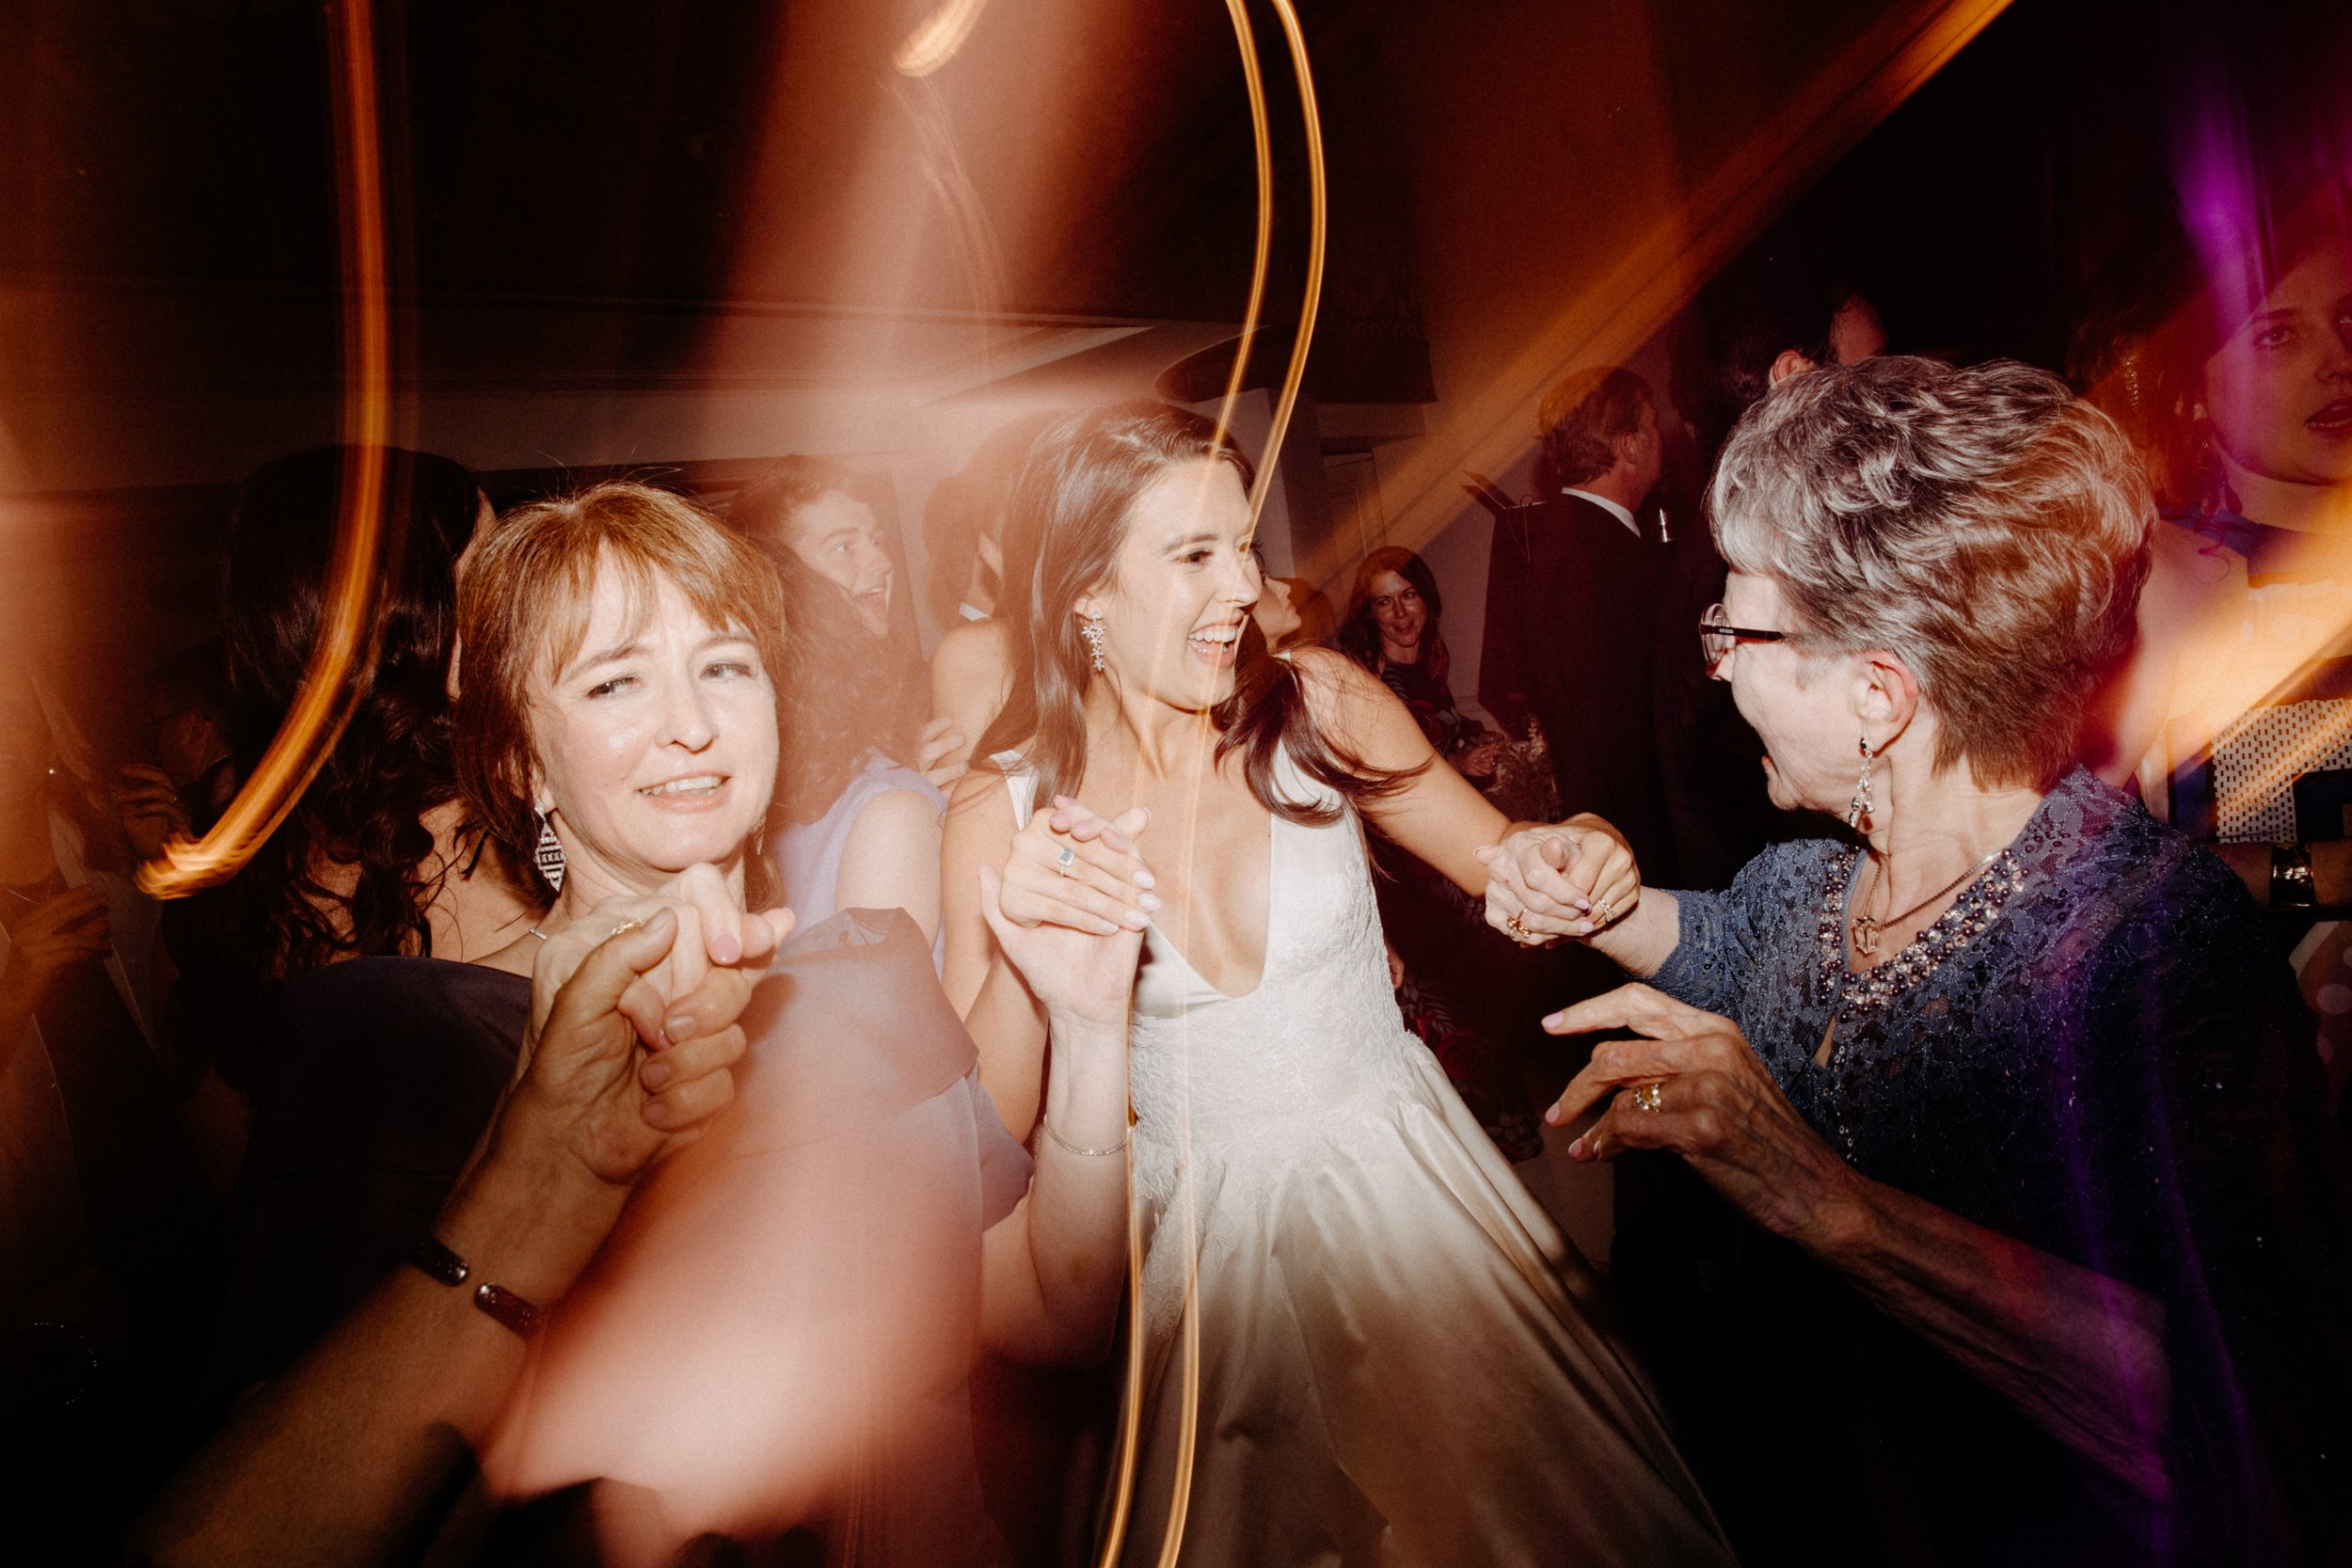 st-anthony-hotel-wedding-photography-10172san-antonio.JPG